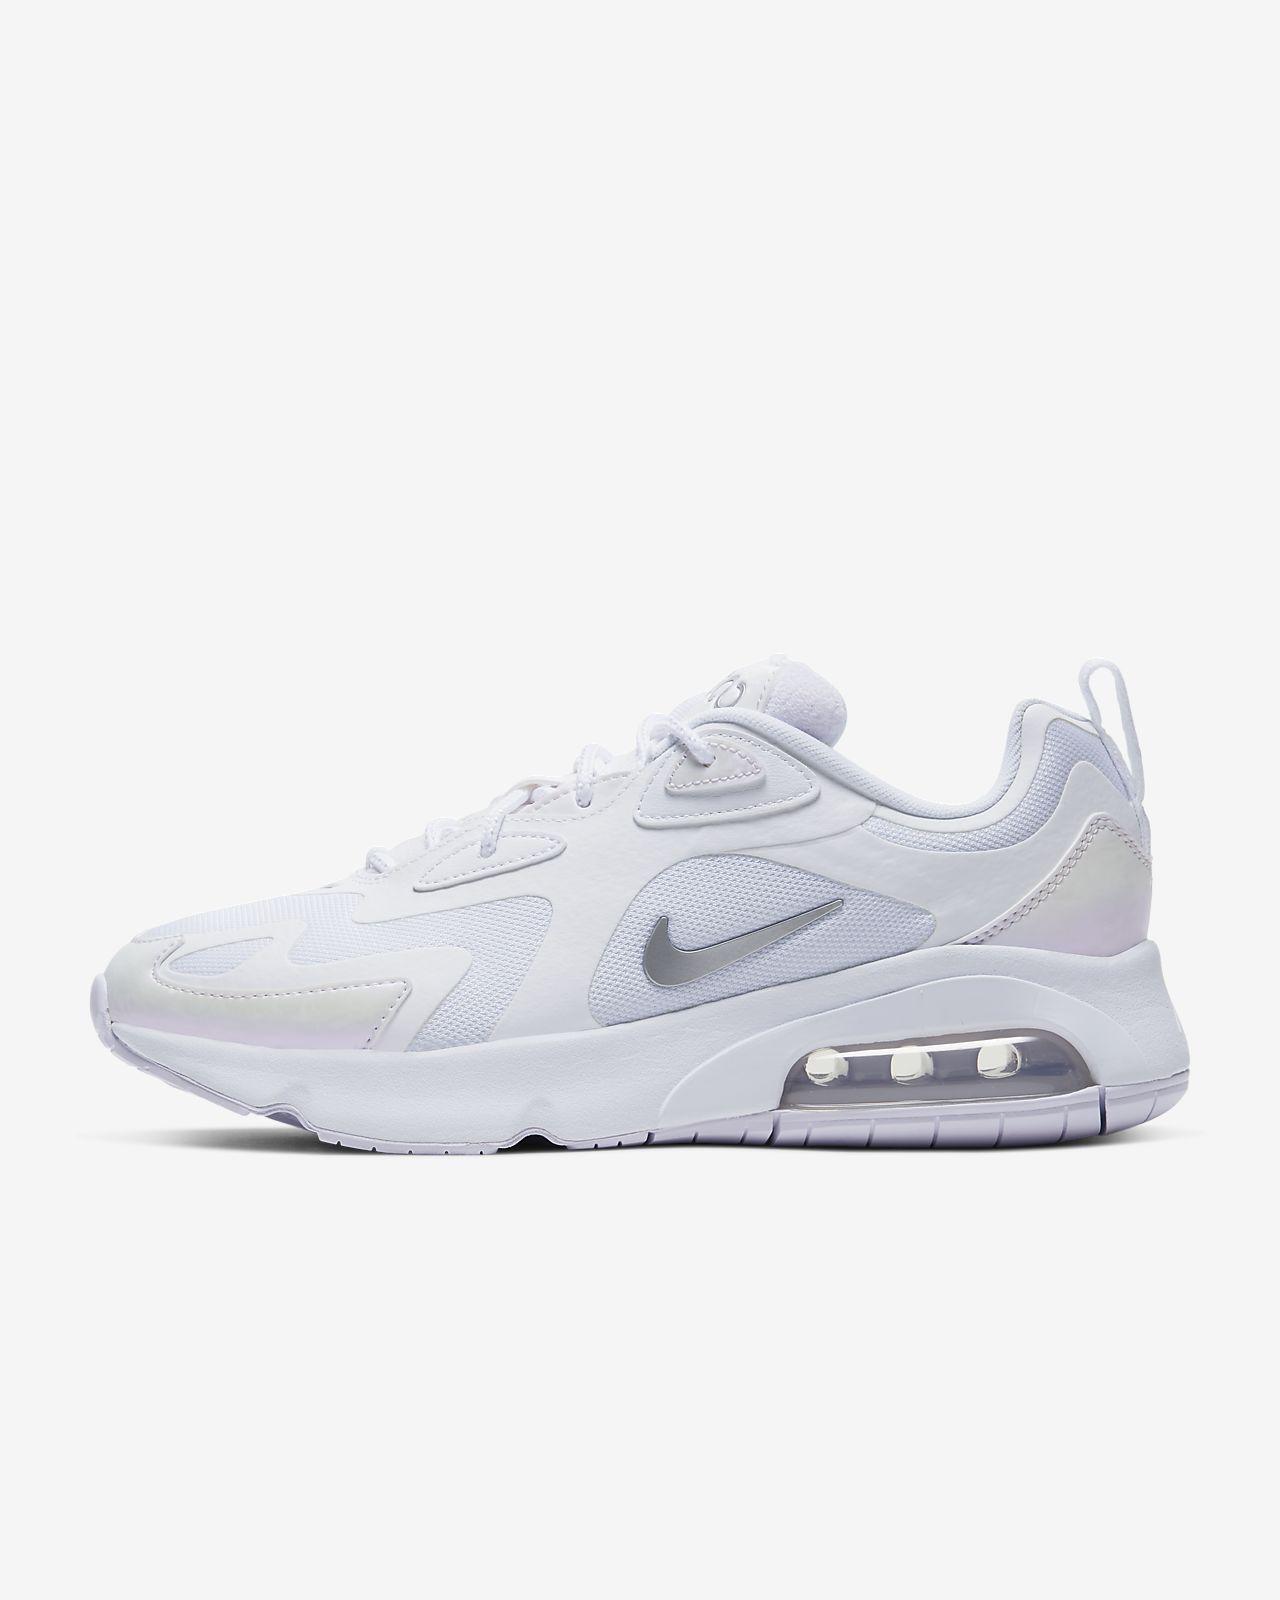 Nike – Air Max 200 – Weiße Sneaker